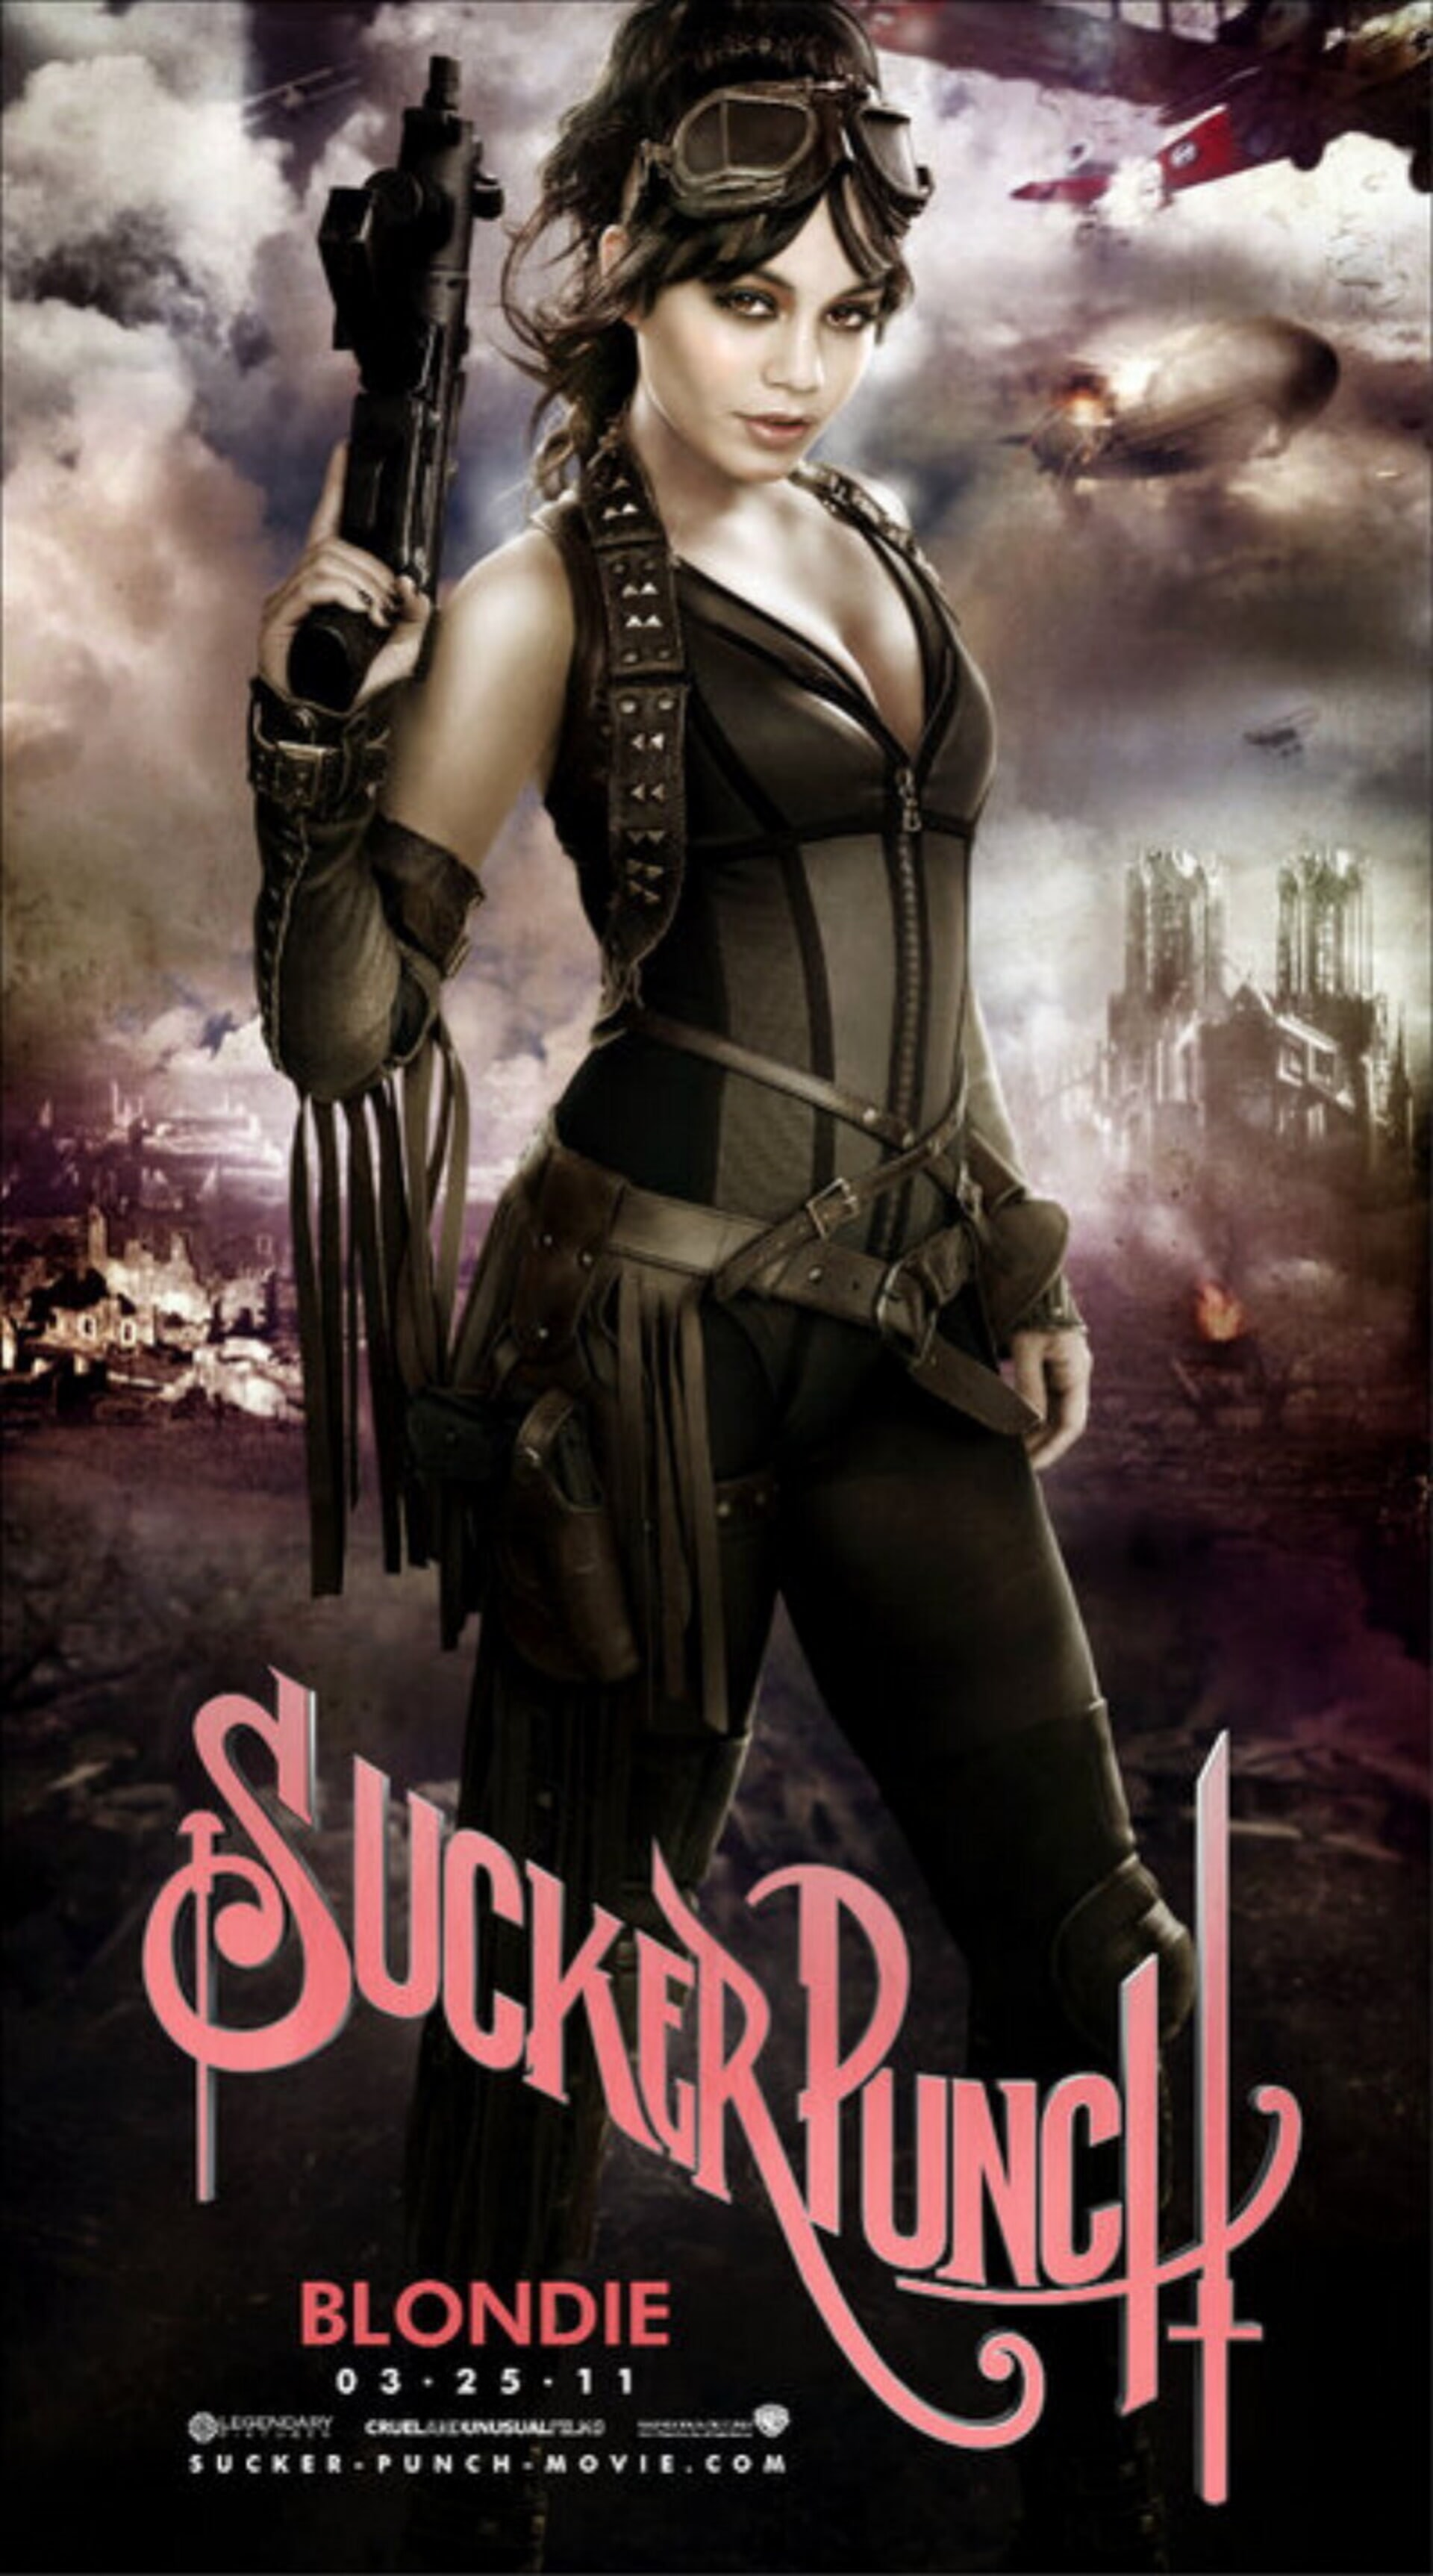 Sucker Punch - Poster 6